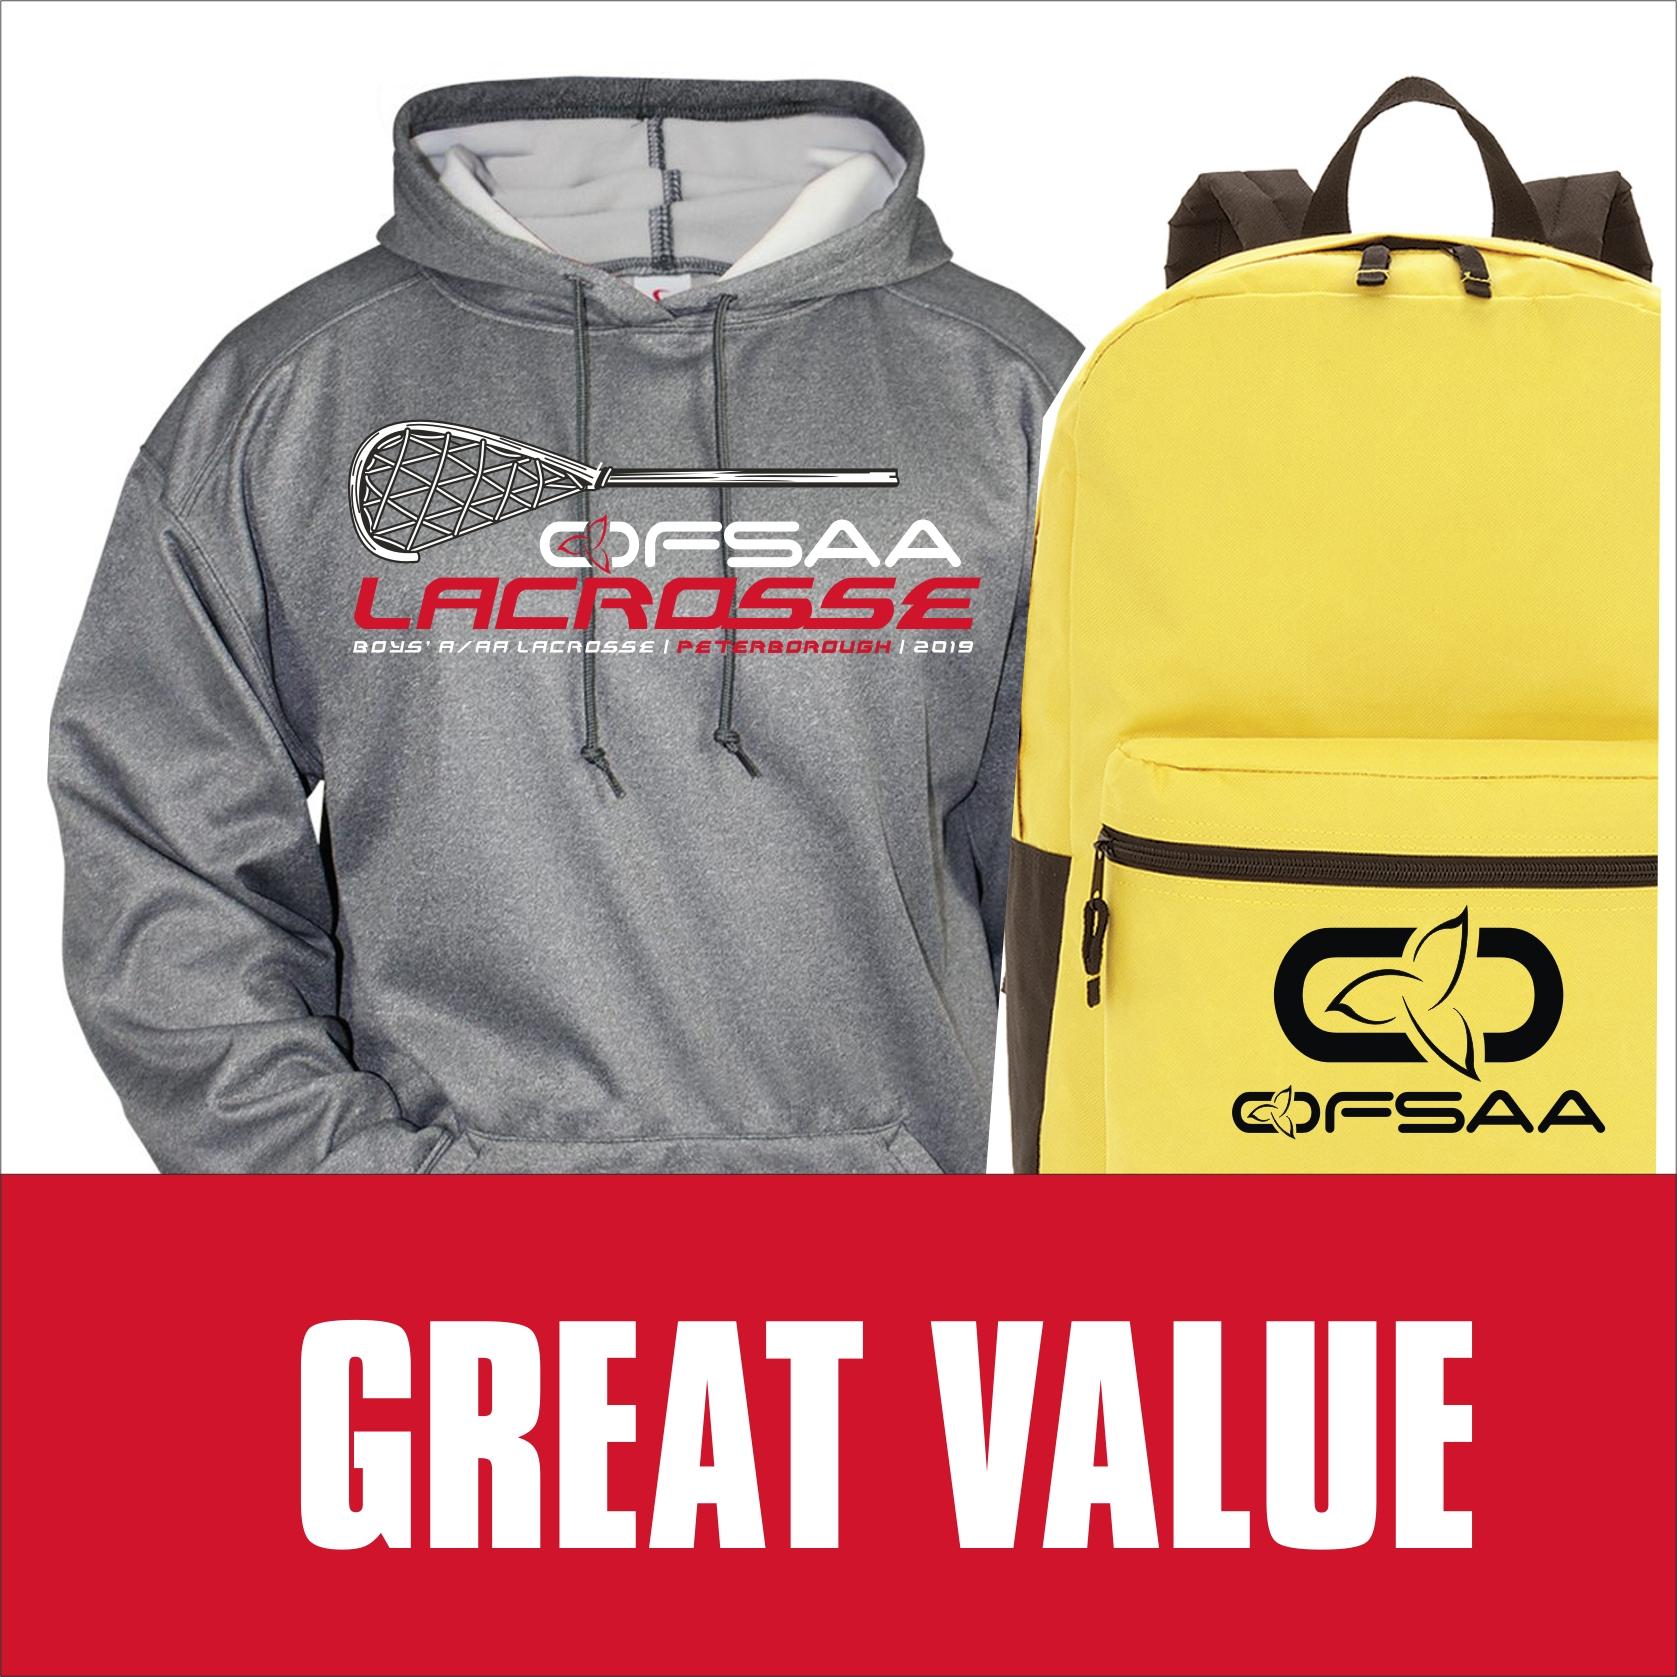 2019 Boys A AA Lacrosse Bag bundle.jpg